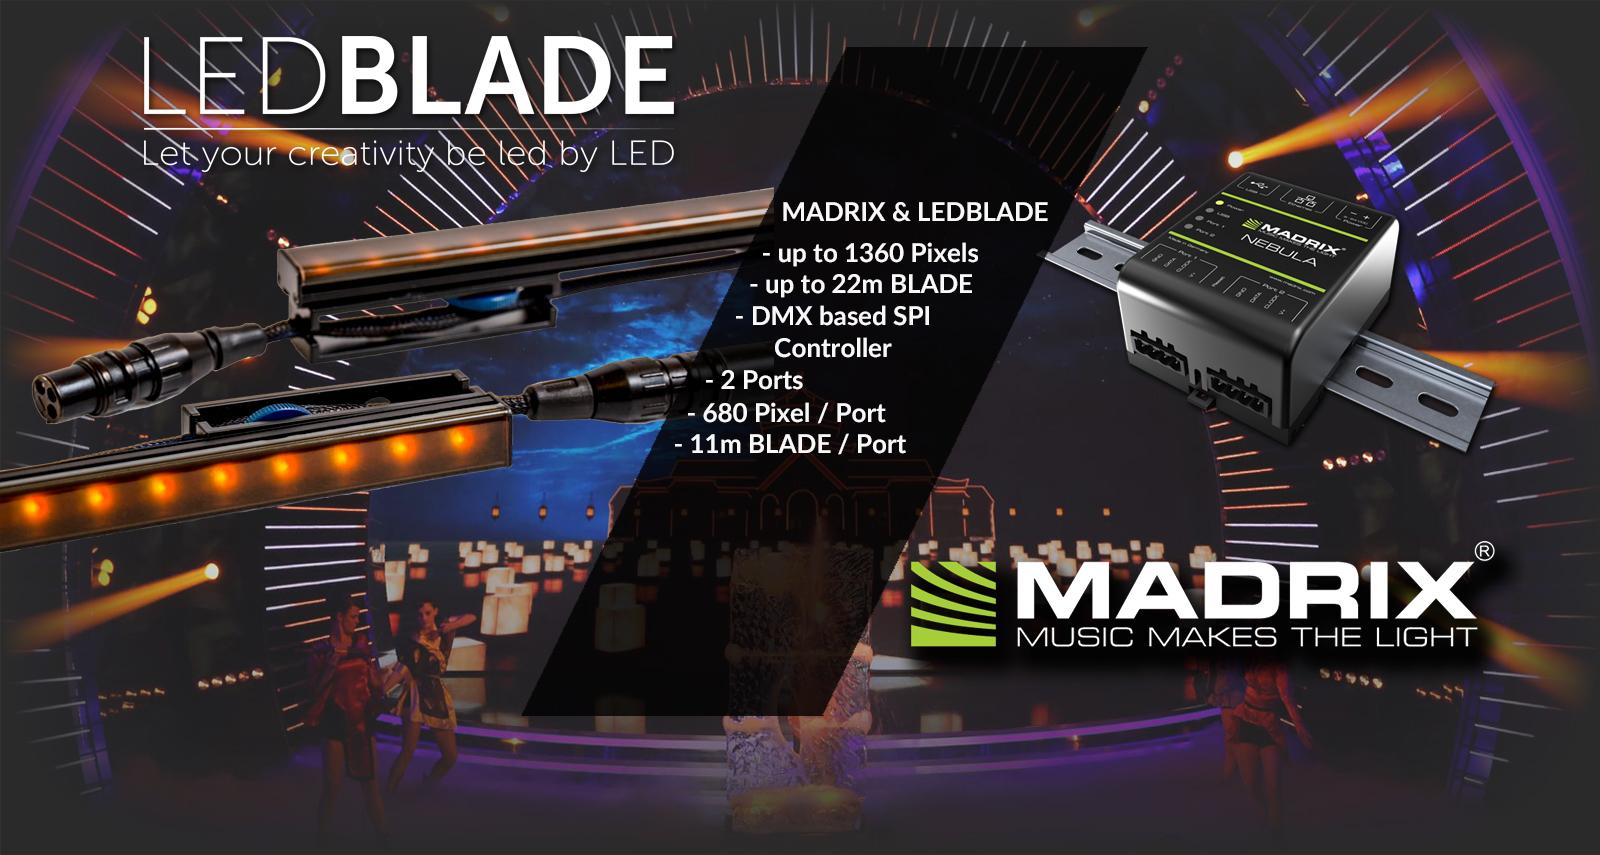 LEDBLADE & MADRIX